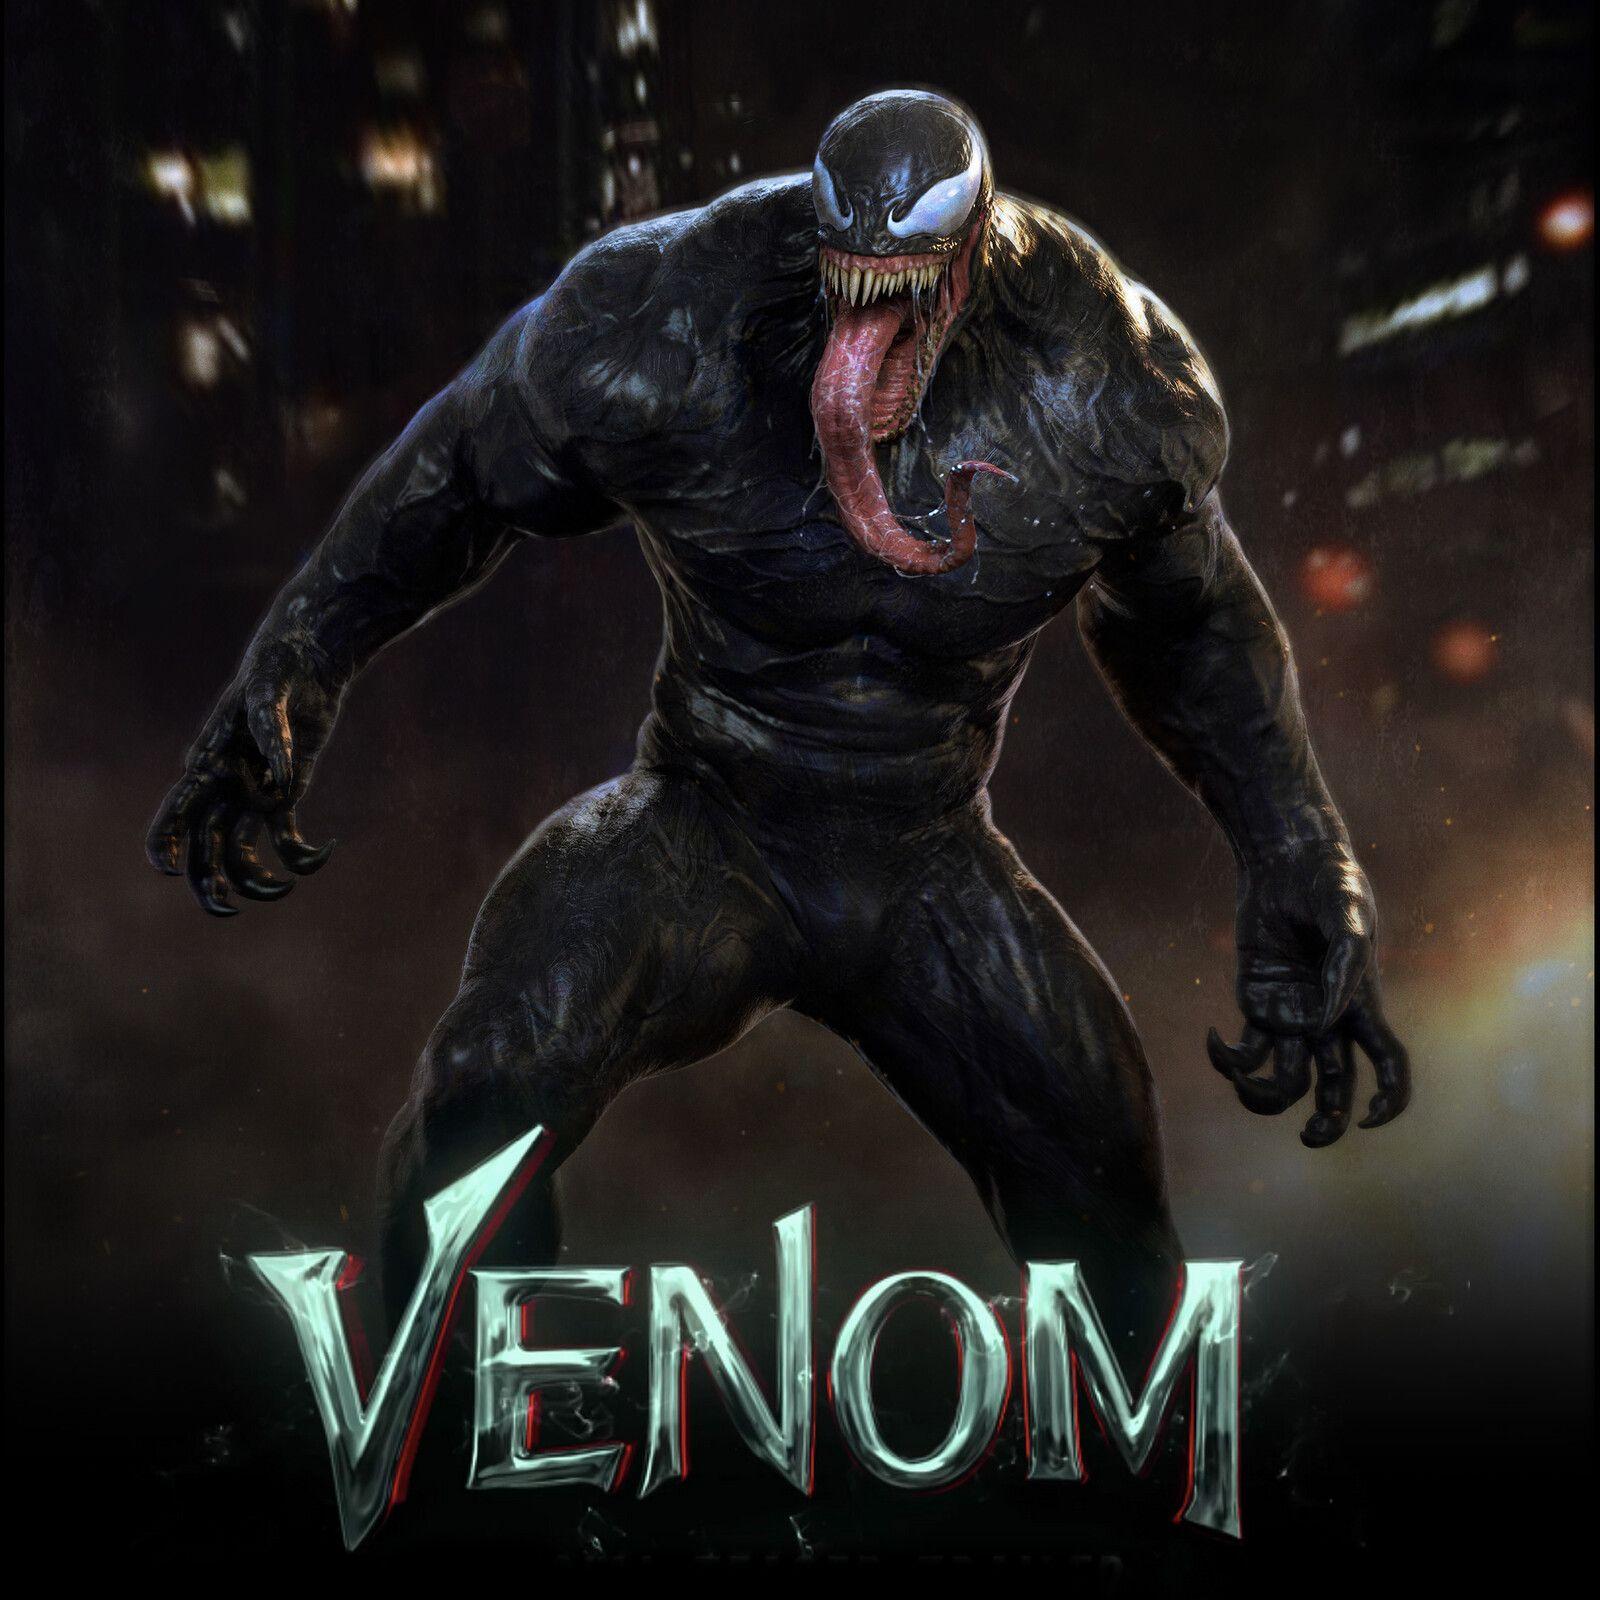 Venom 2 Concept Art Venom Comics Venom Marvel Venom